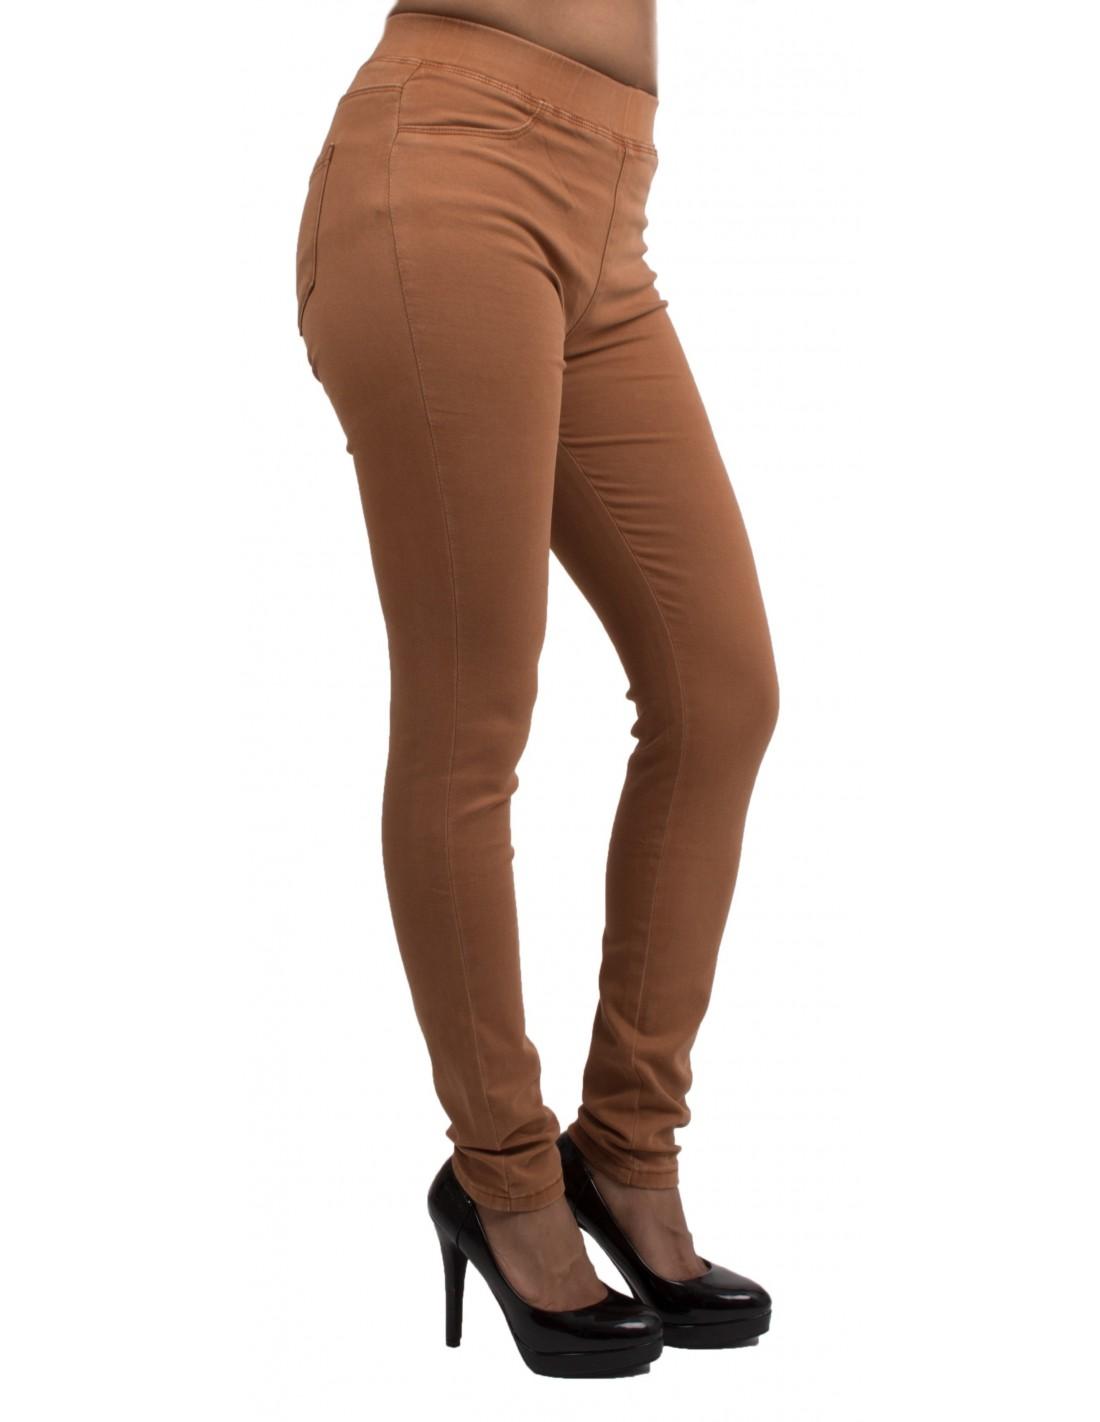 Haute Femme Ultra Stretch Camel Jean Forme Slim Jegging Taille vN8n0wOm